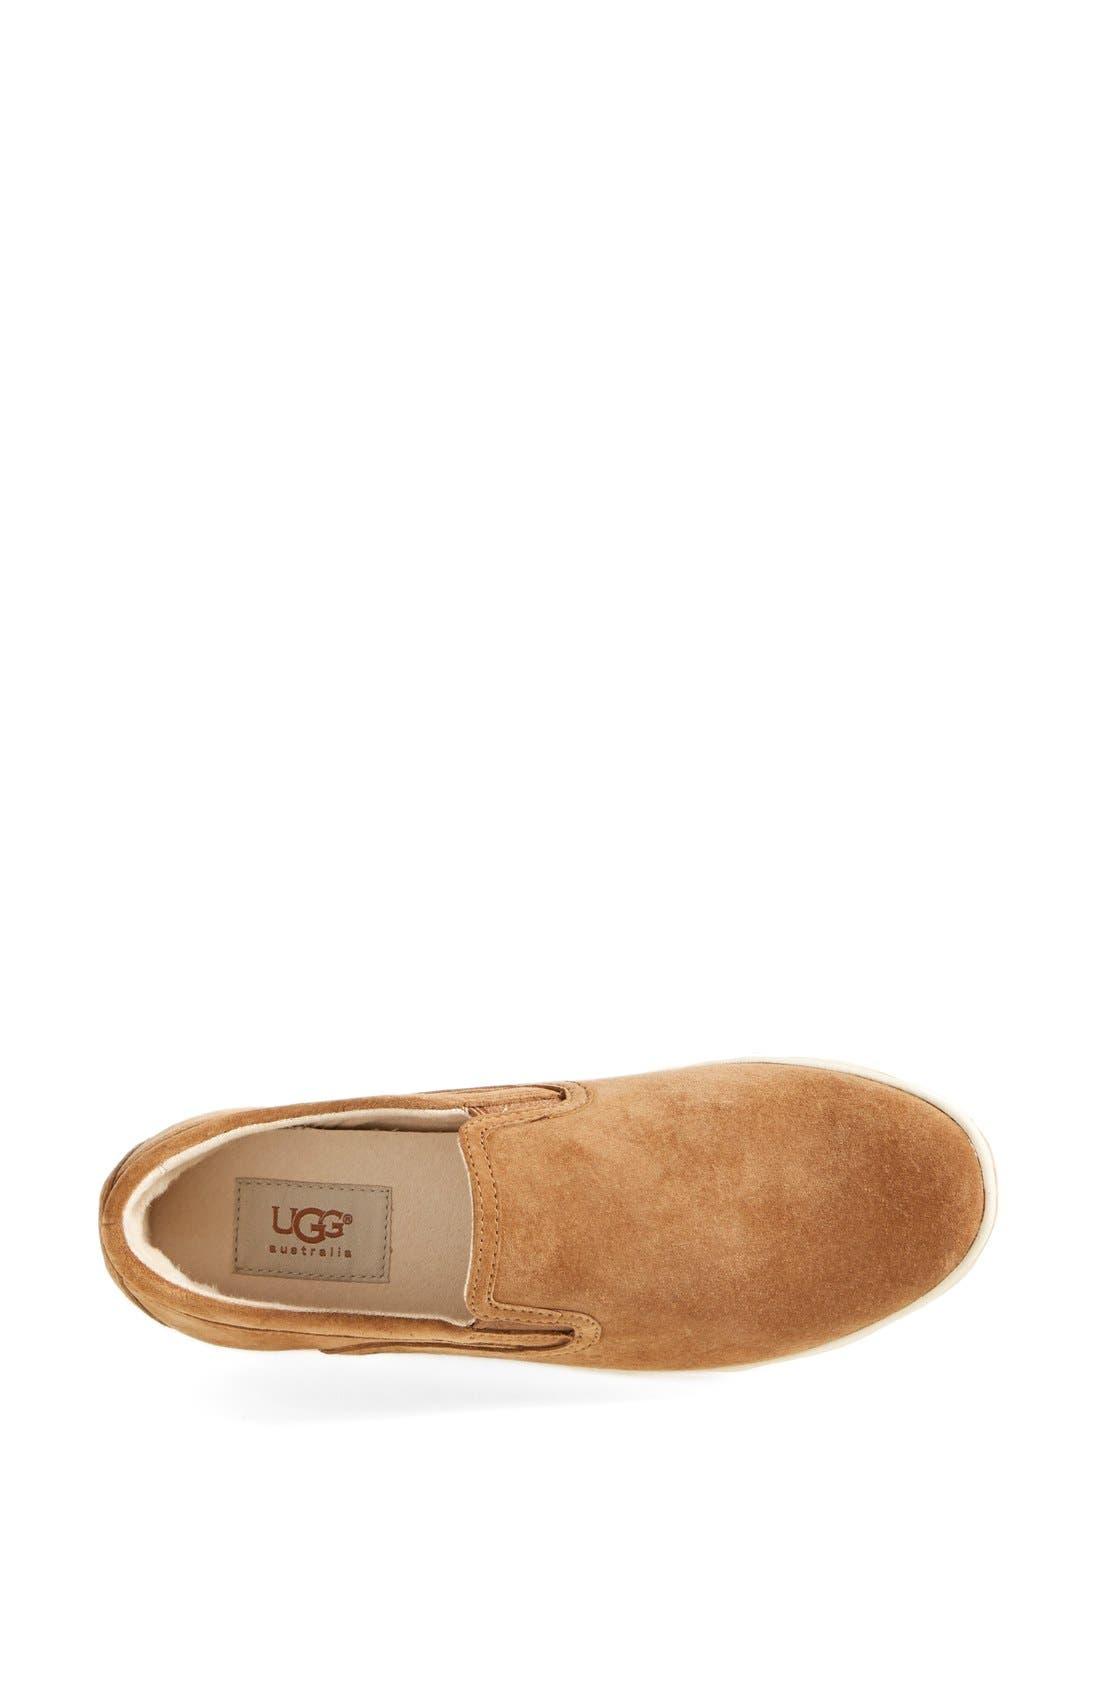 UGG<SUP>®</SUP>, Fierce Water Resistant Suede Slip-On Sneaker, Alternate thumbnail 3, color, 219